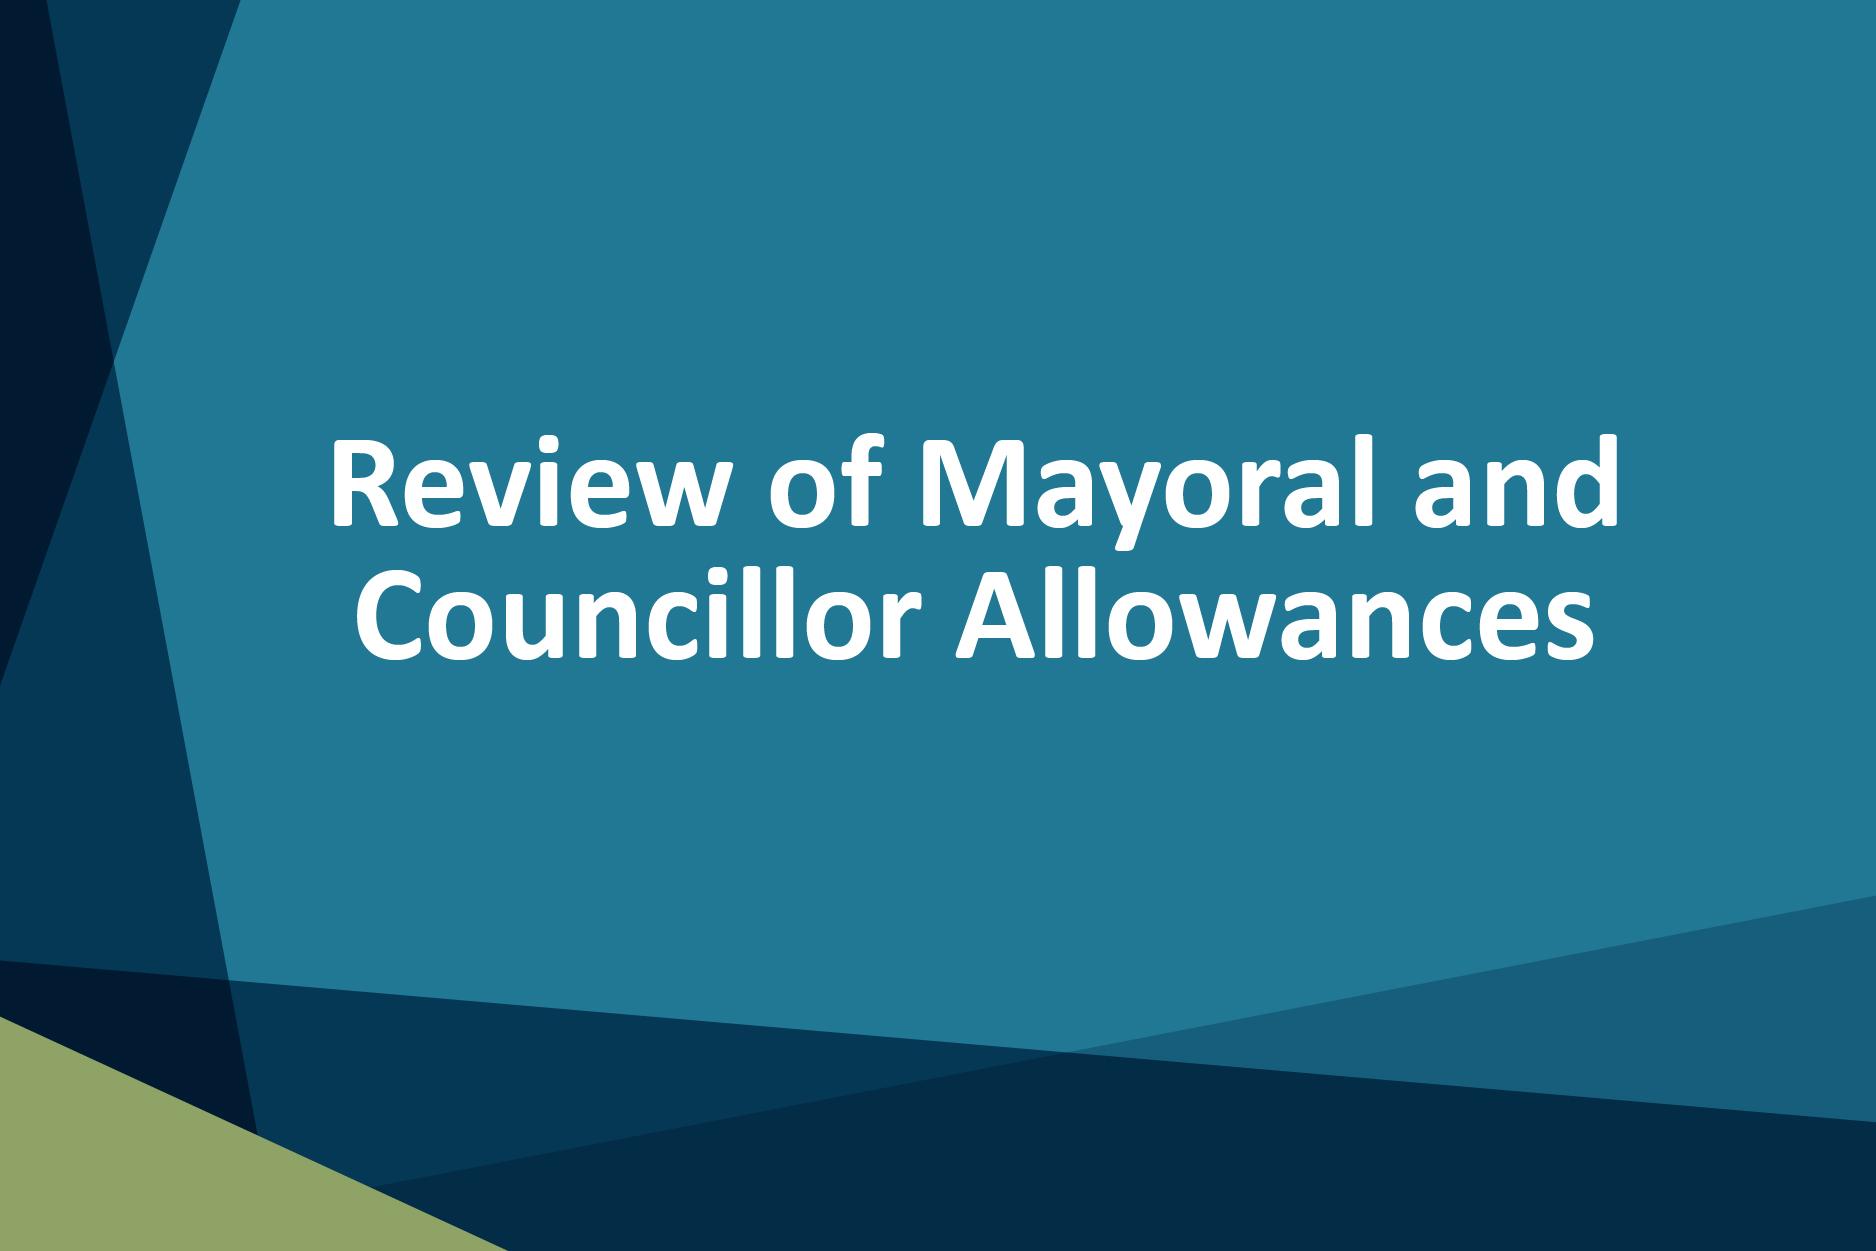 Golden Plains Shire Council Review of Mayoral and Councillor Allowances